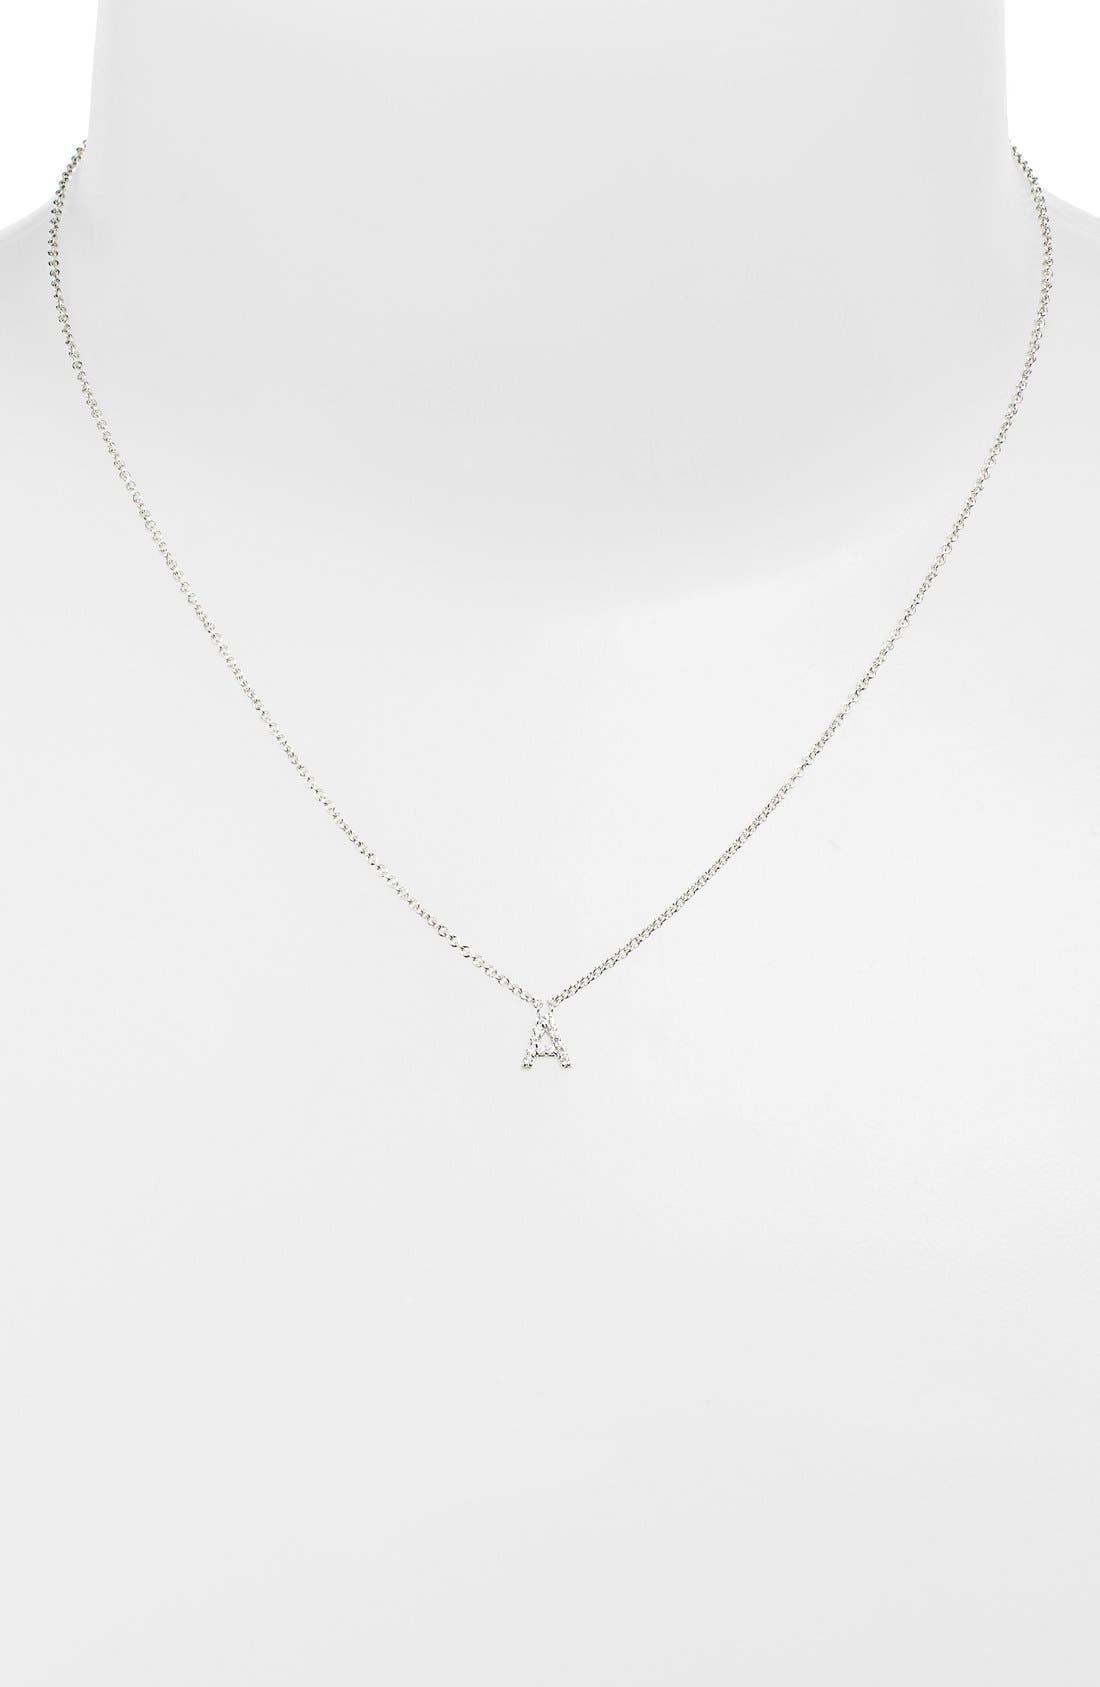 'Initial' Pendant Necklace,                             Main thumbnail 1, color,                             041